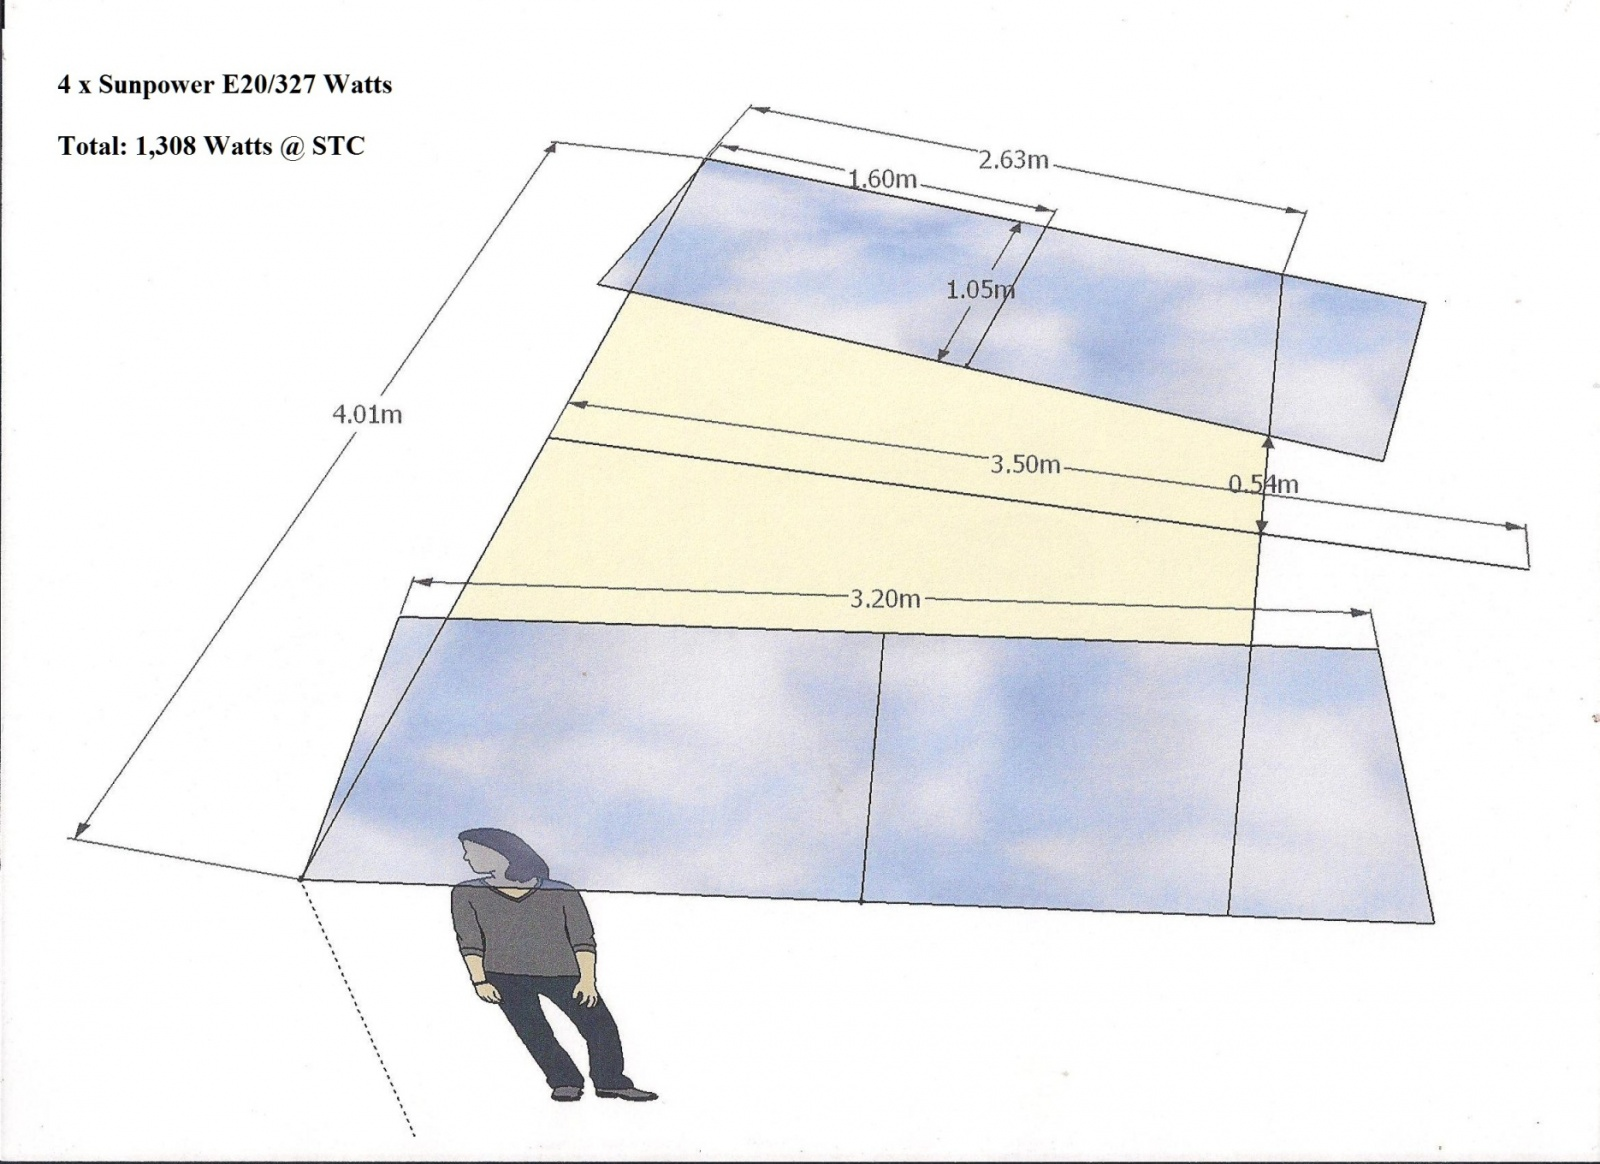 Click image for larger version  Name:4 Sunpowe E20-327 Watt EM.jpg Views:148 Size:376.1 KB ID:51563